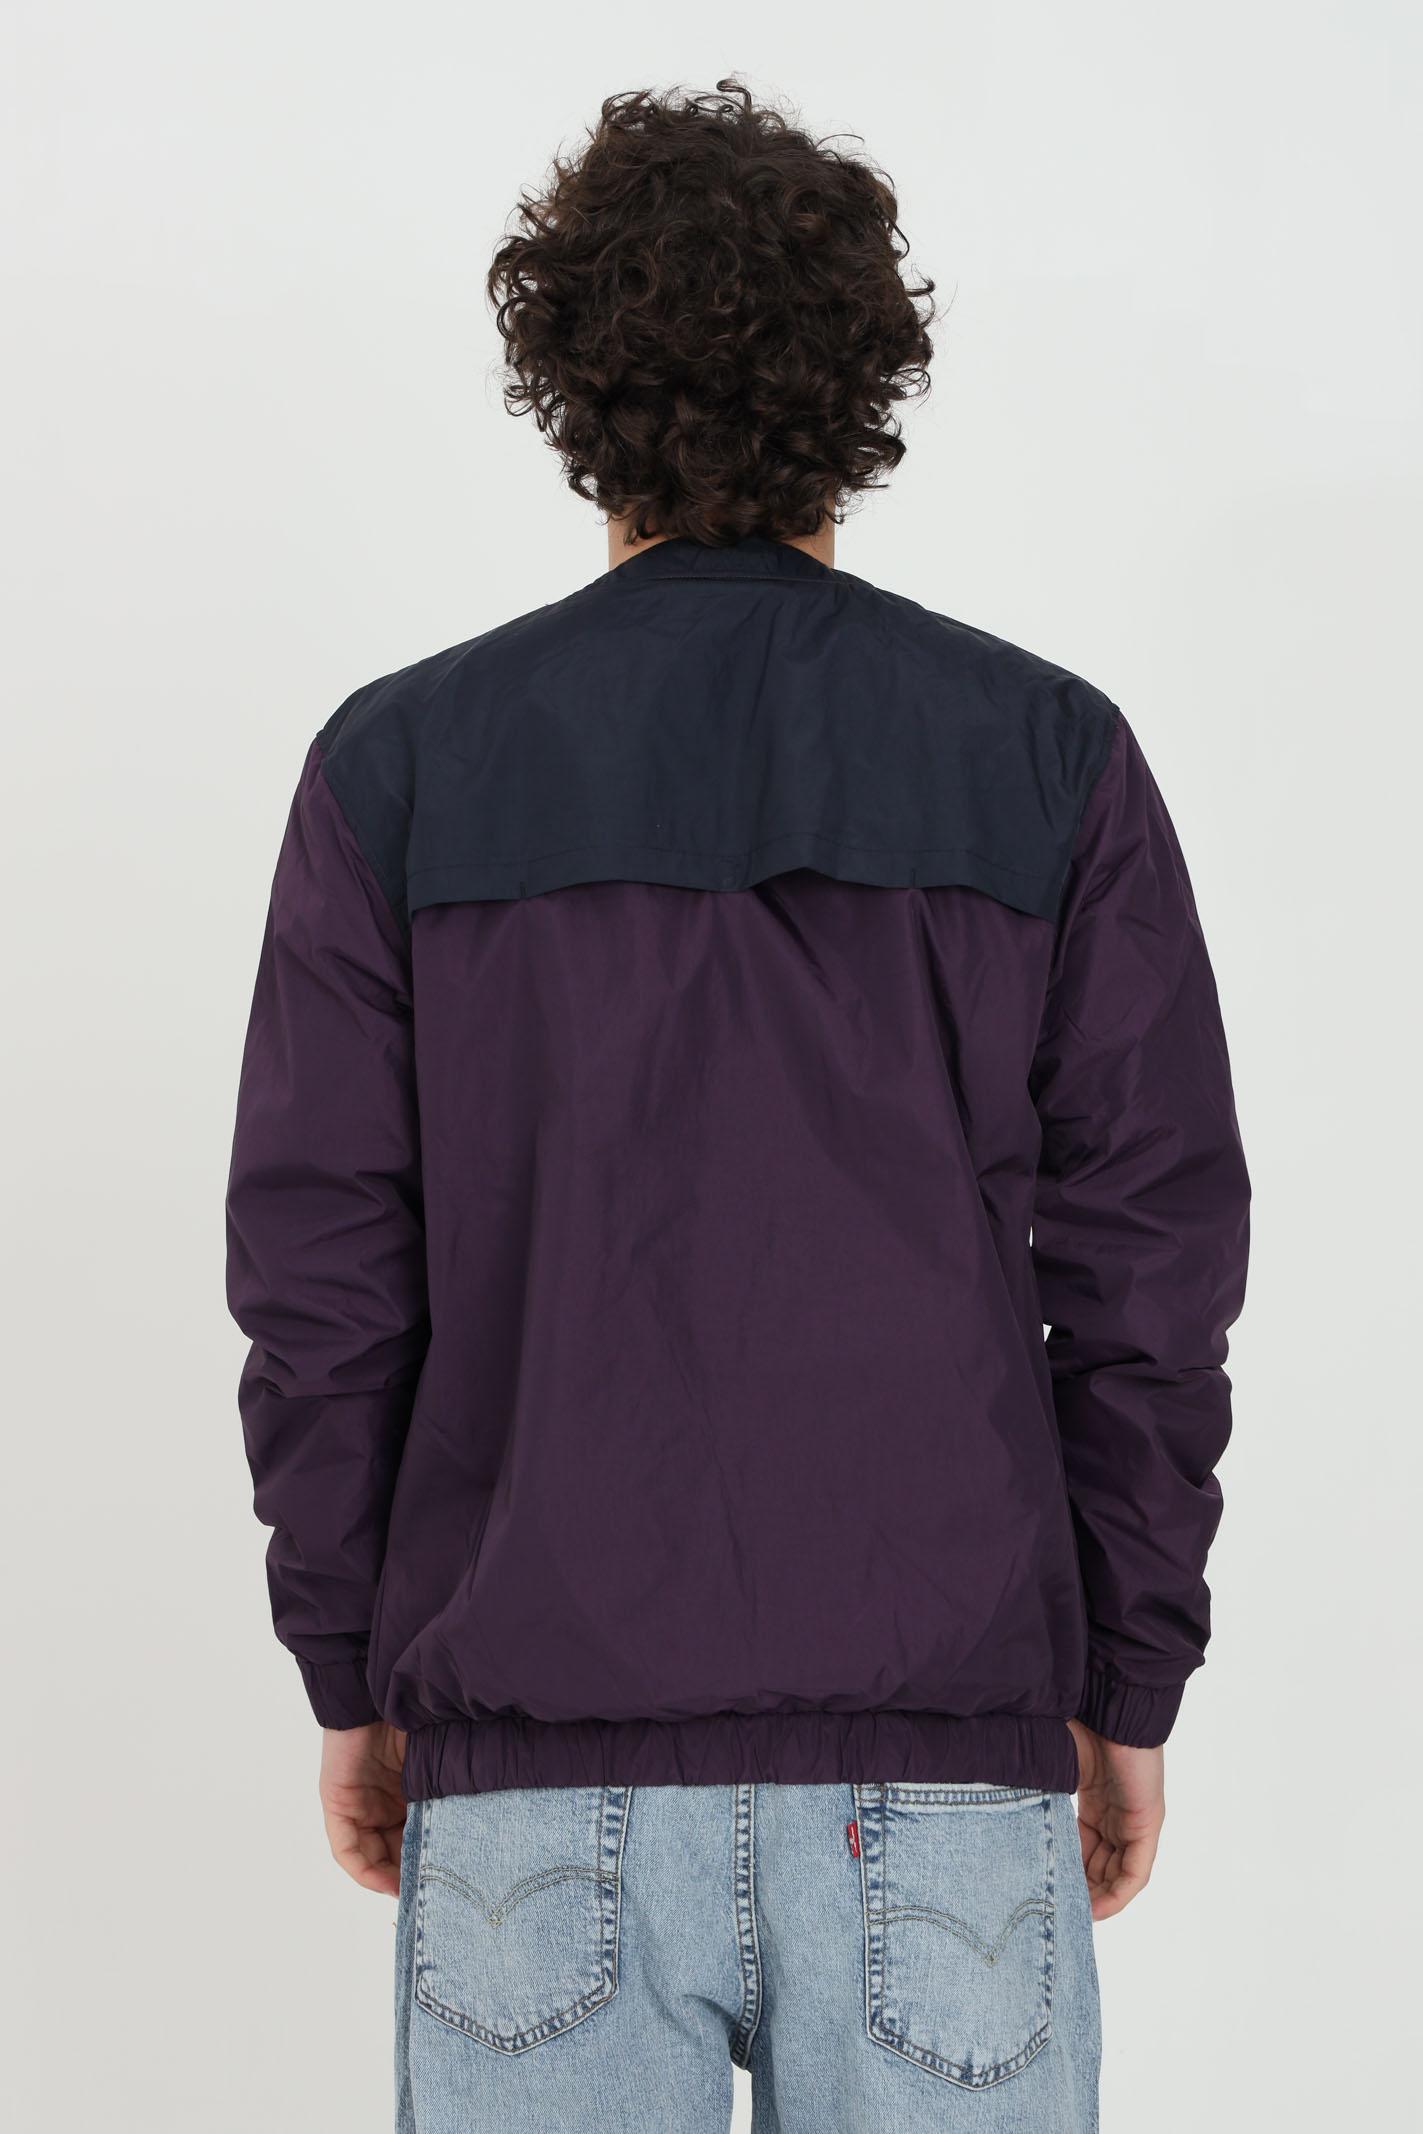 Purple windbreaker, long sleeves, brand: Ma.strum MA.STRUM | Jacket | MAS1474M526